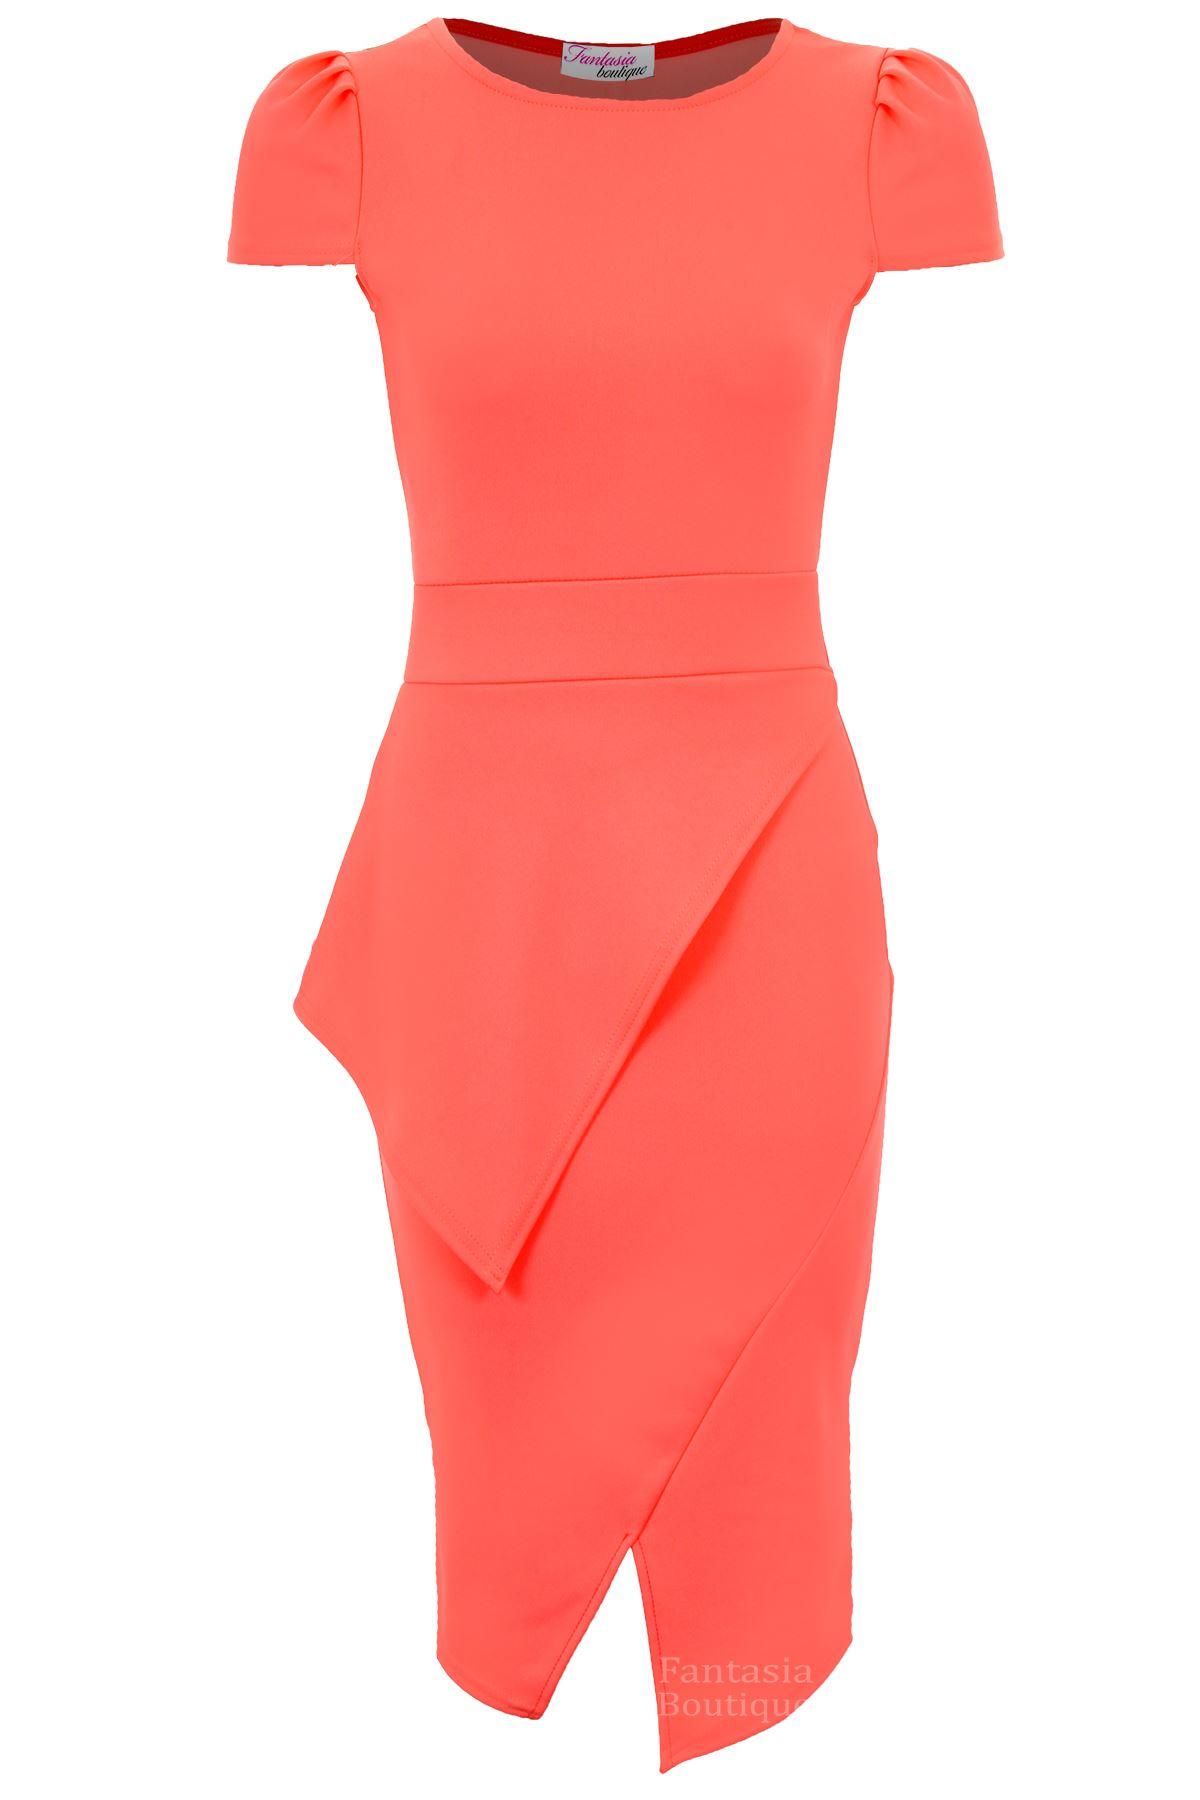 Ladies-Cap-Sleeve-Asymmetric-Neon-Pencil-Bodycon-Sexy-Women-039-s-Midi-Party-Dress